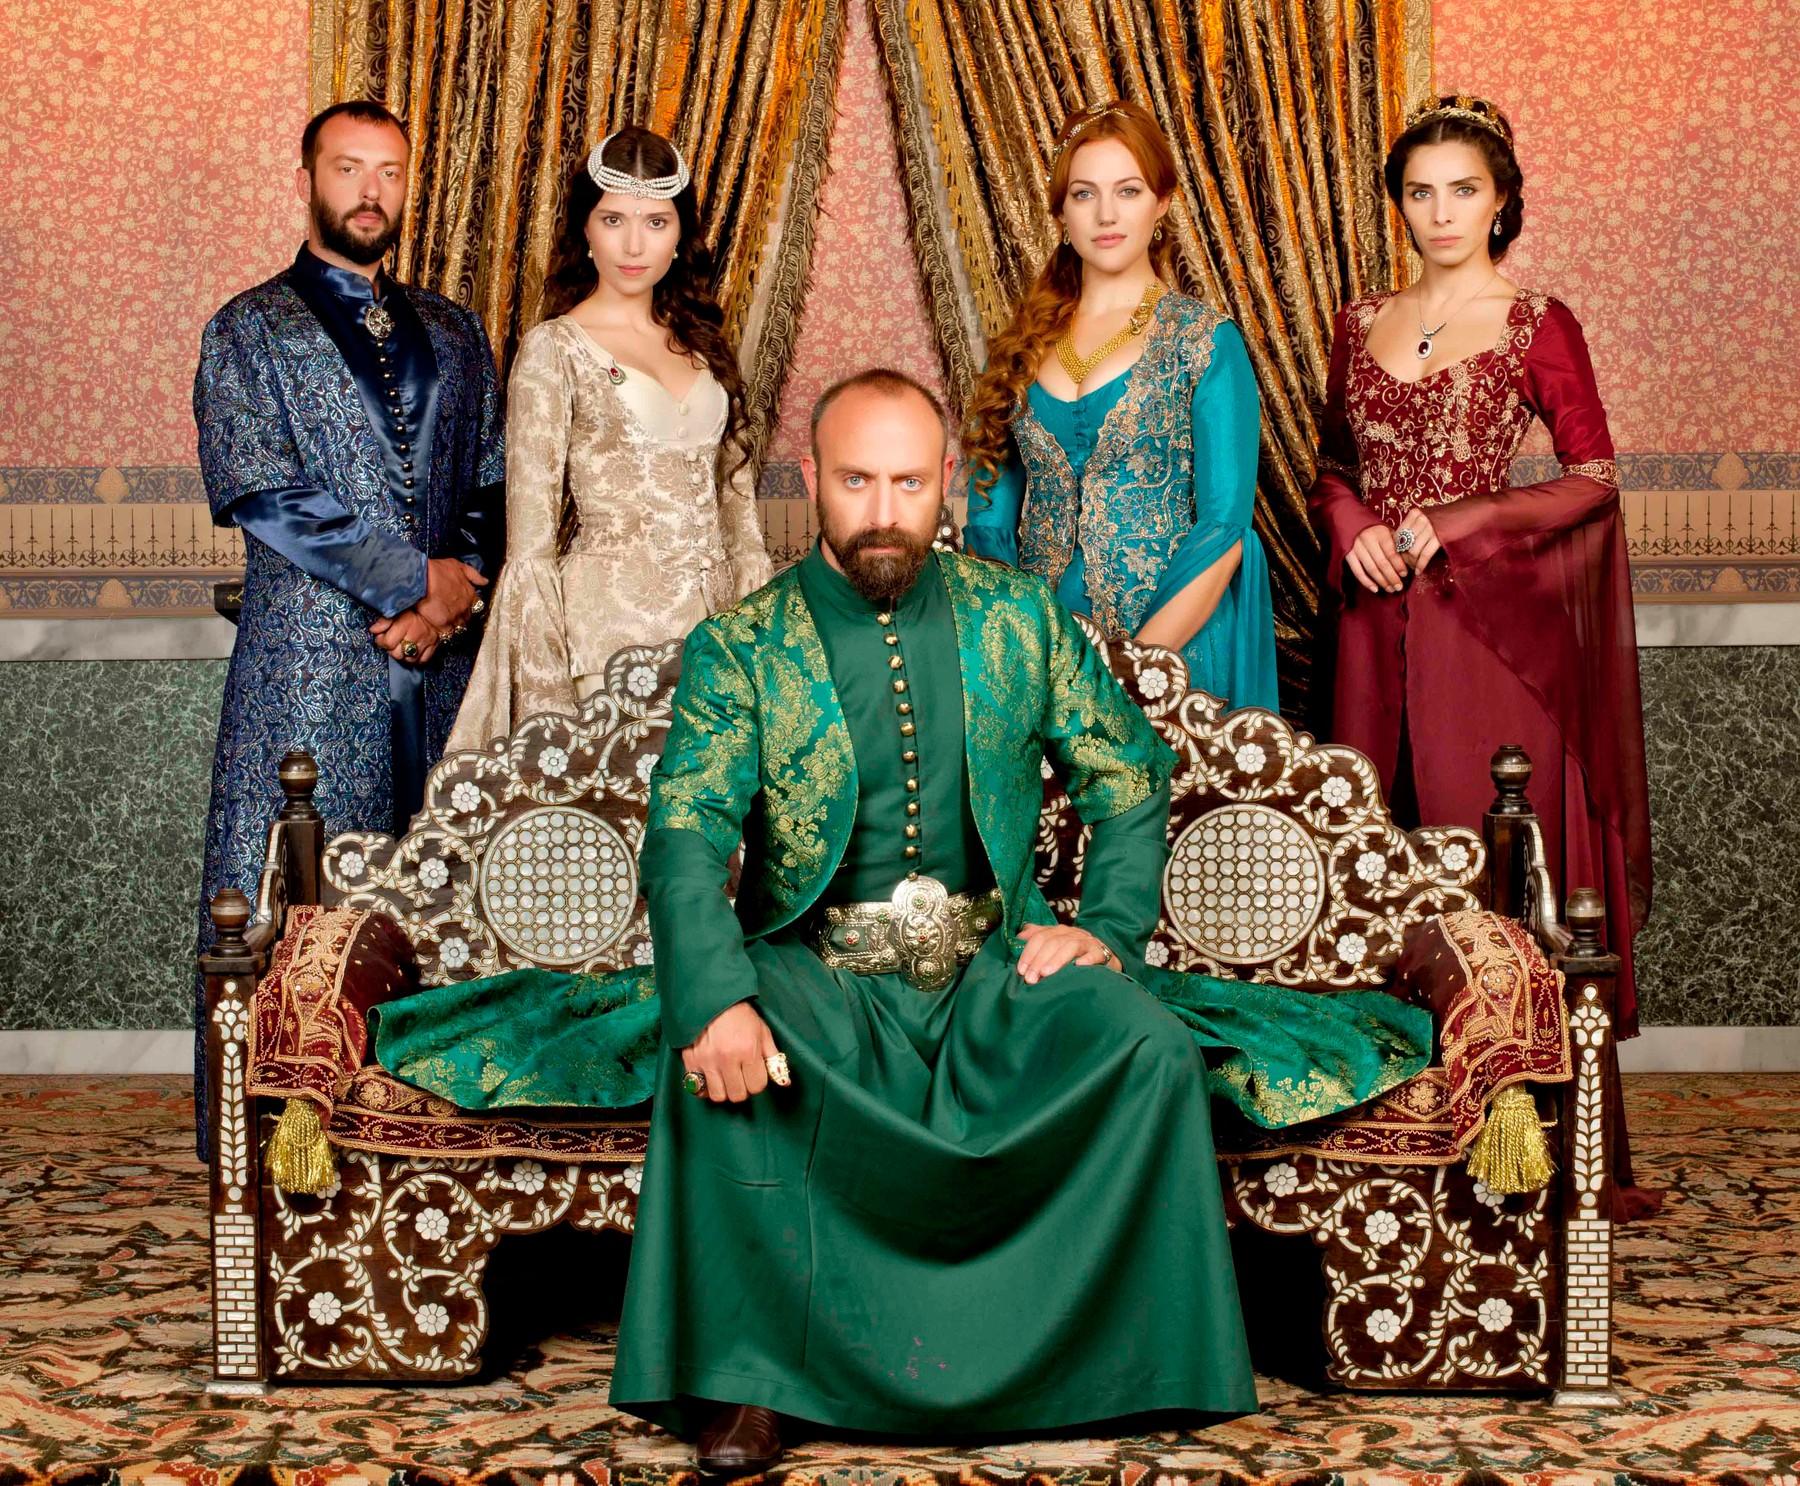 'Sulejman Veličanstveni'